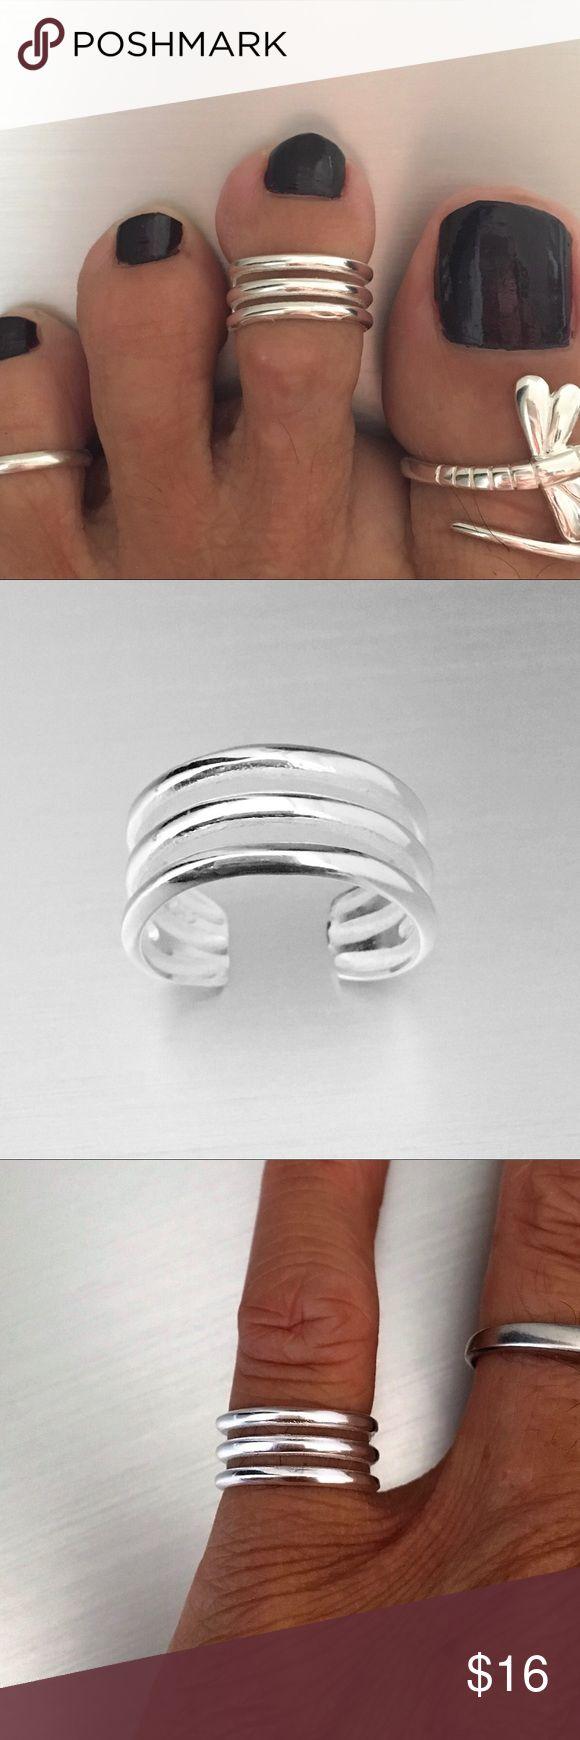 Sterling Silver Cuff Band Toe Ring Sterling Silver Triple Cuff Band Toe Ring, Midi Ring, Pinky Ring, Adjustable Ring, 925 Sterling Silver, PLEASE VISIT MY SITE indigoandjade.com Jewelry Rings